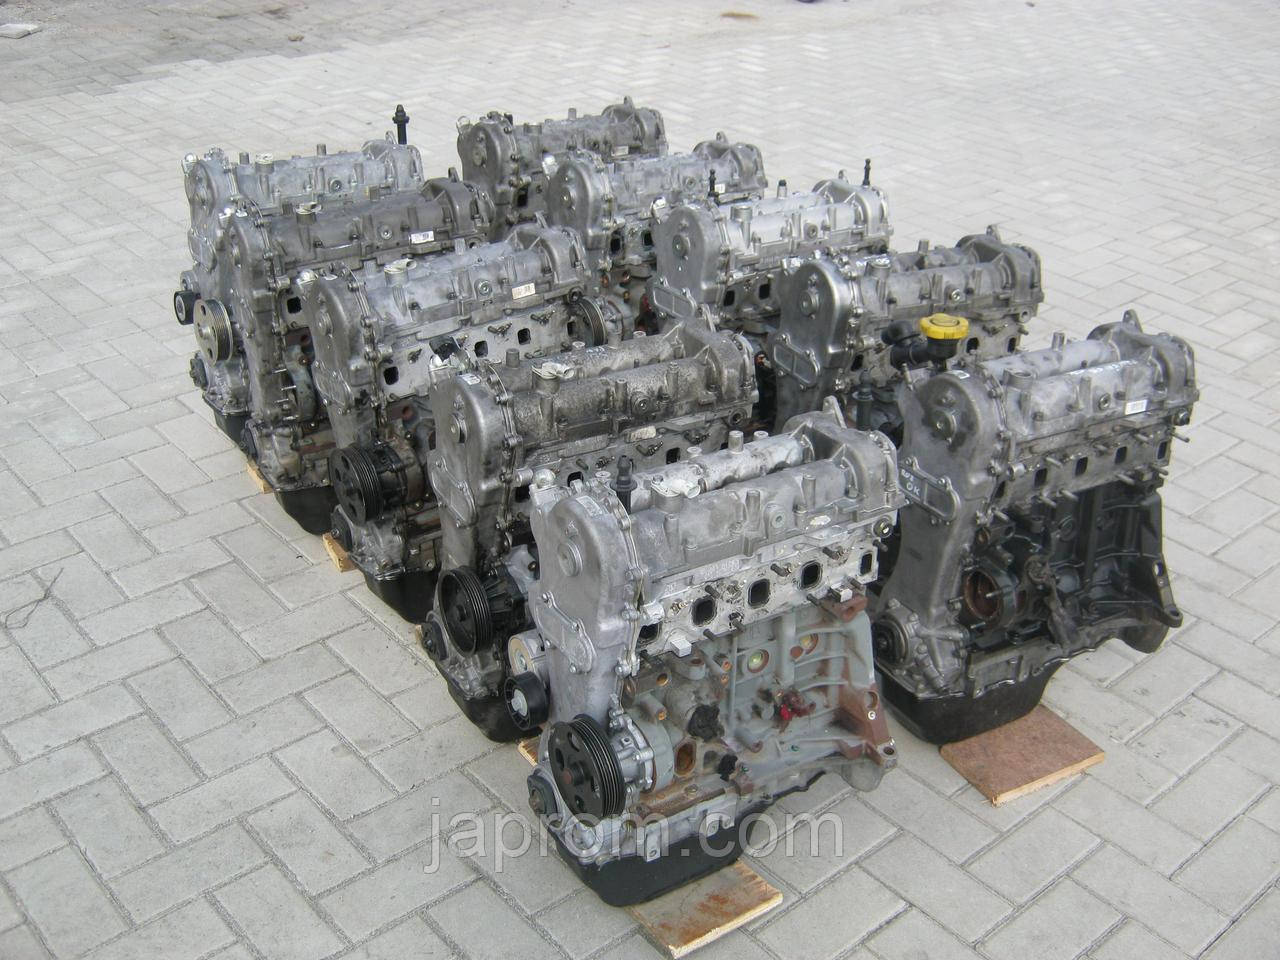 Мотор (Двигатель) Opel Corsa C, Corsa D, Meriva, Astra H, Combo, Agila 1.3 CDTI